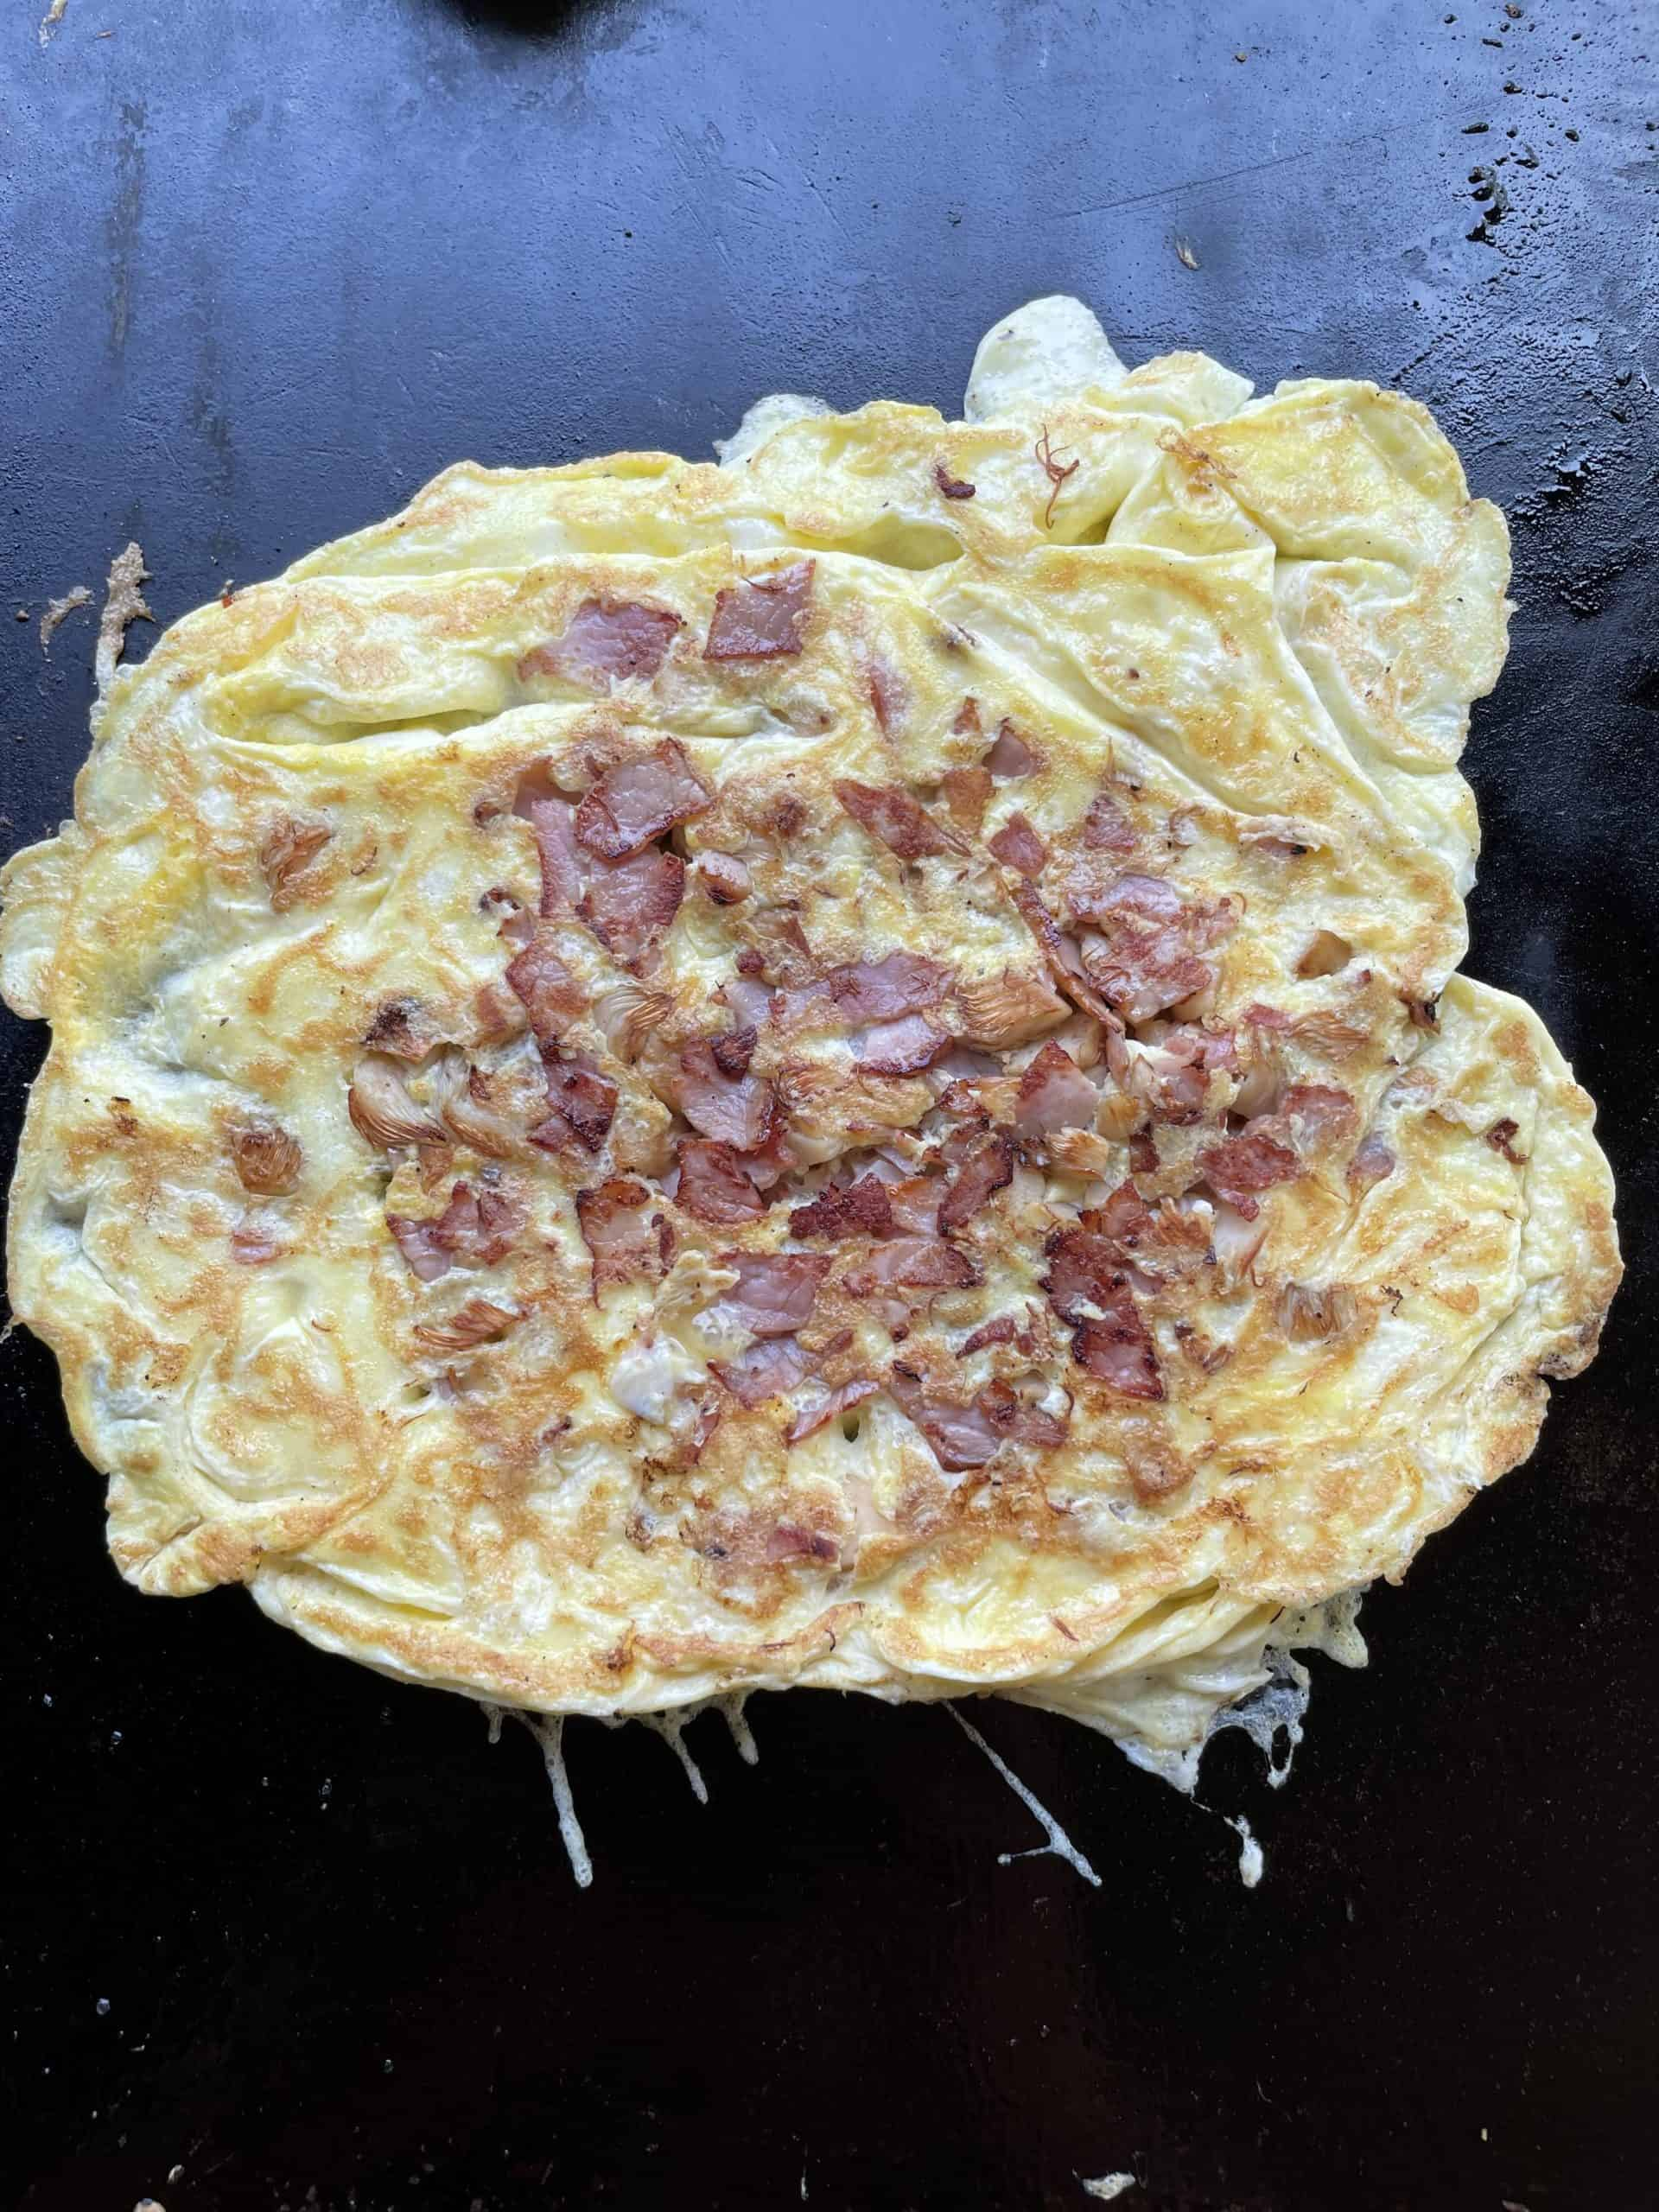 Flipped Griddle Omelette